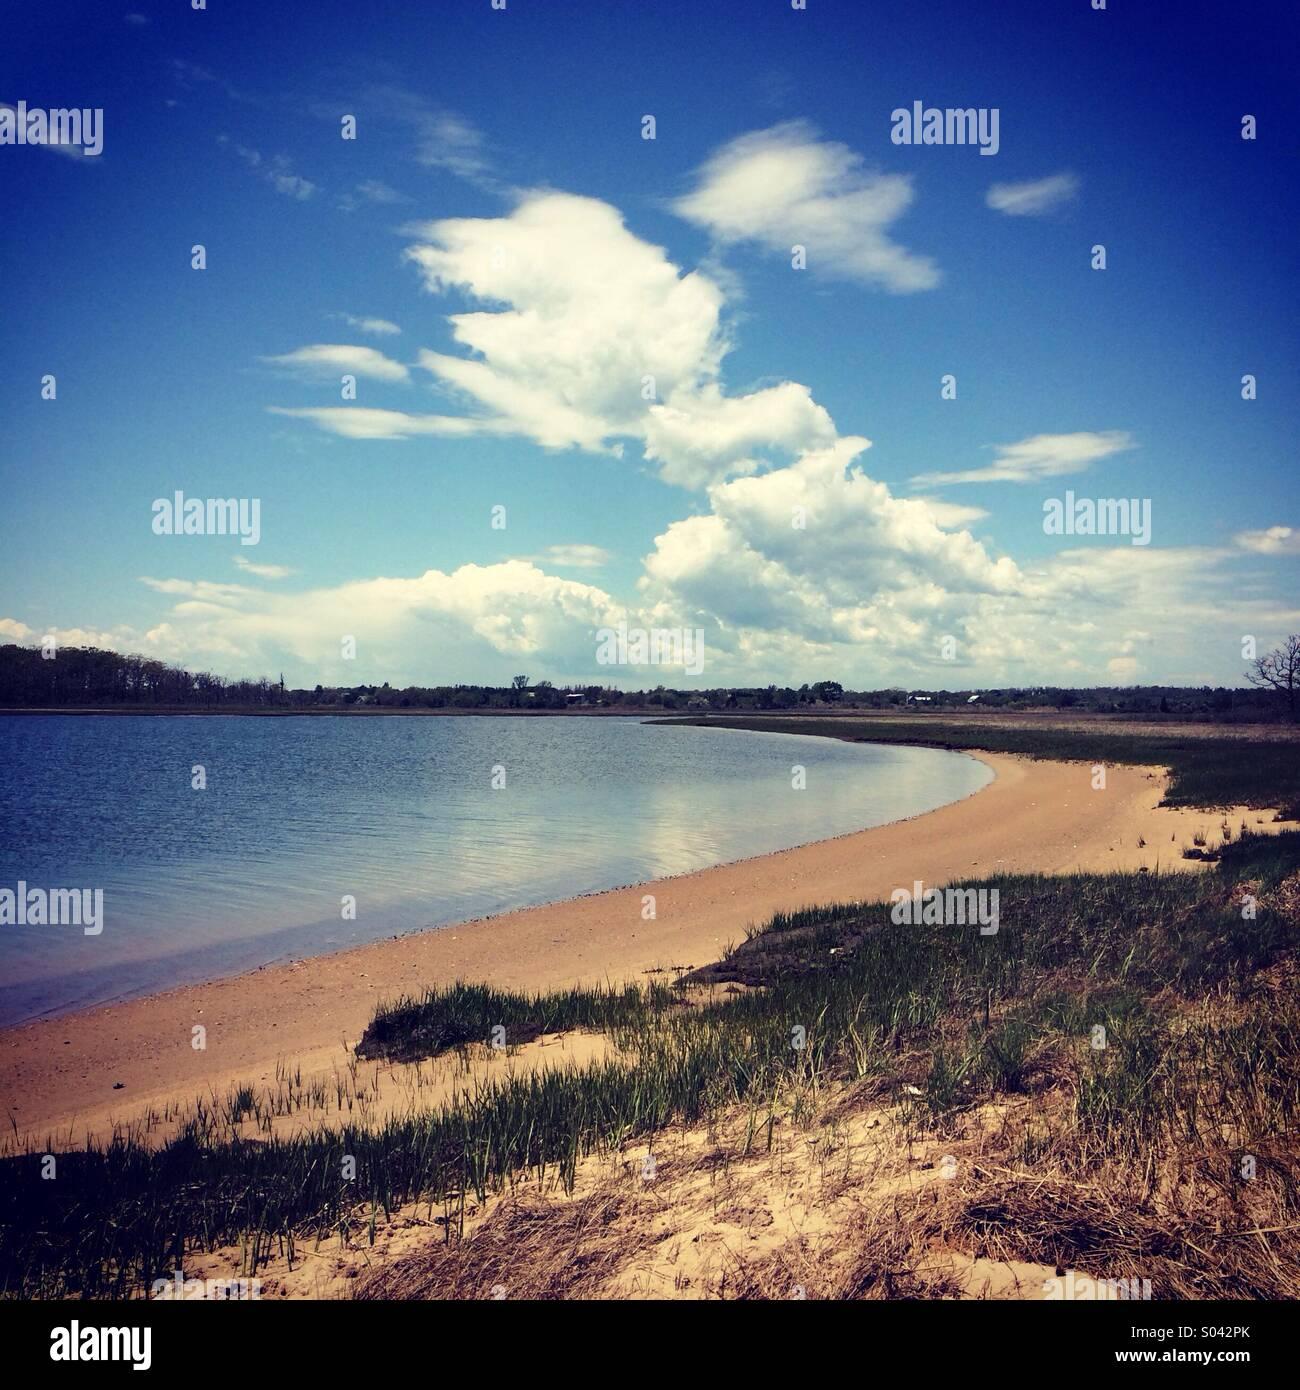 summer-beach-in-orient-ny-S042PK.jpg